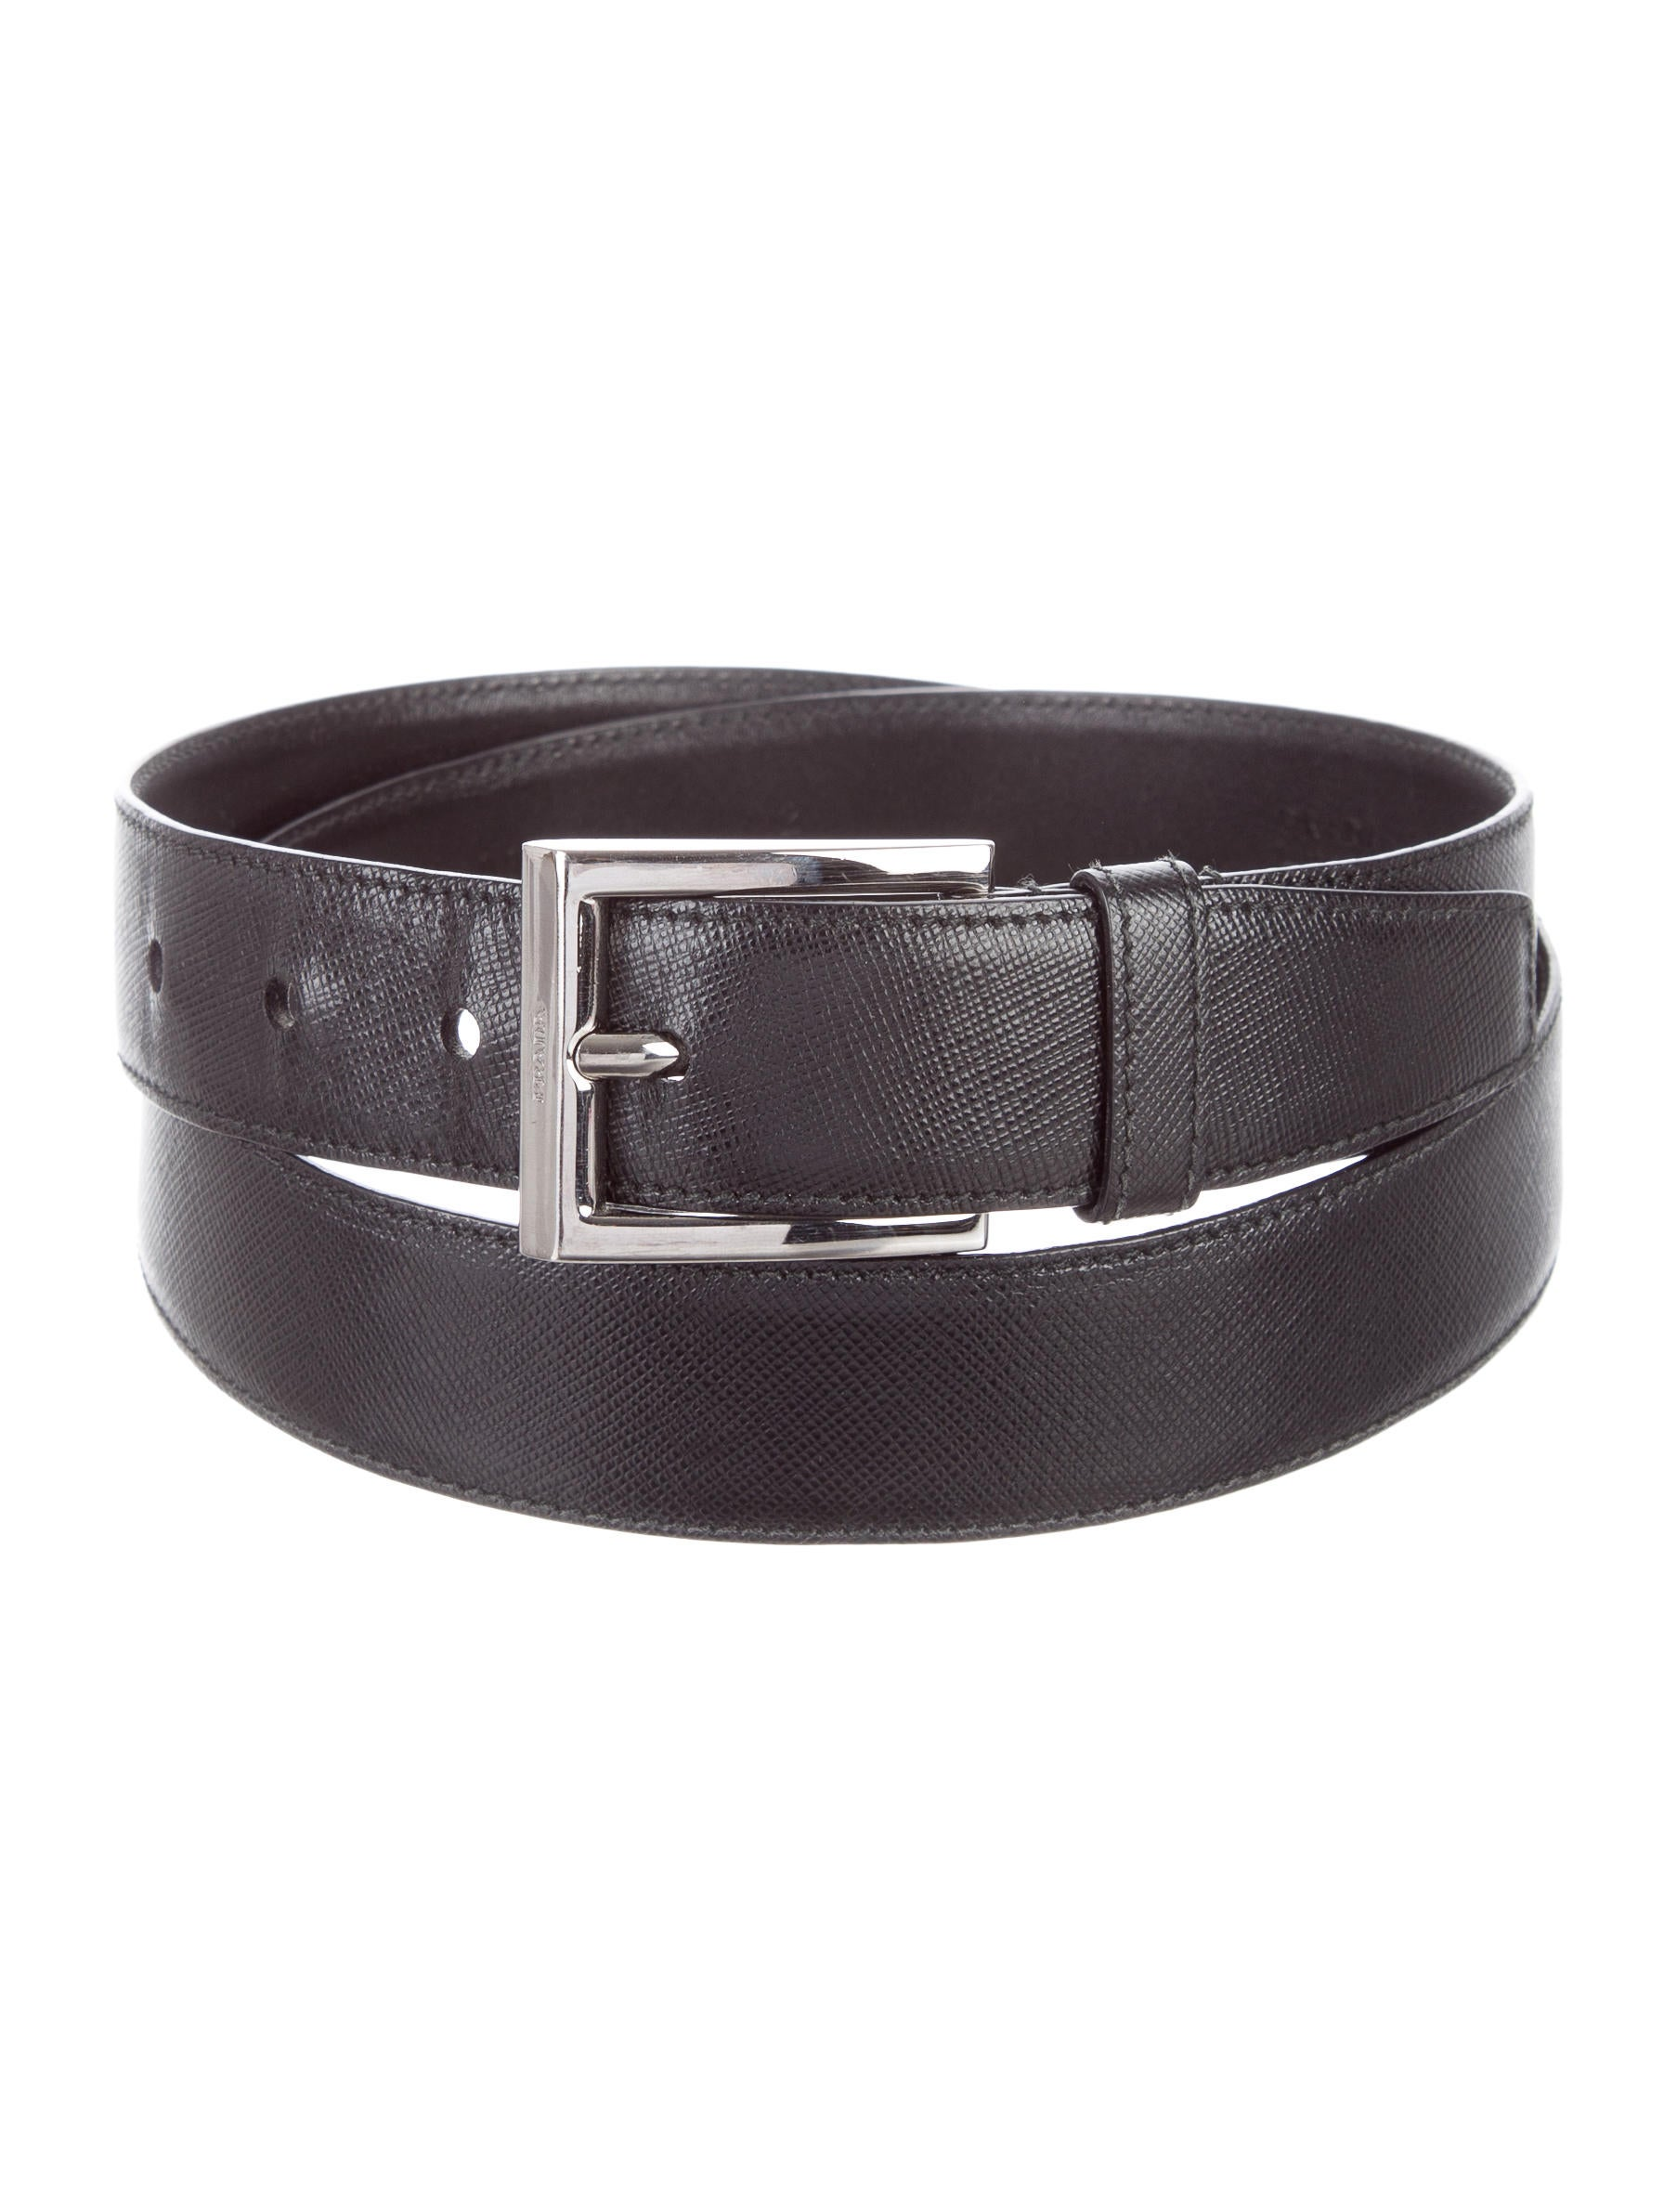 1a51c6898eea3 Prada Saffiano Belt Bag Price